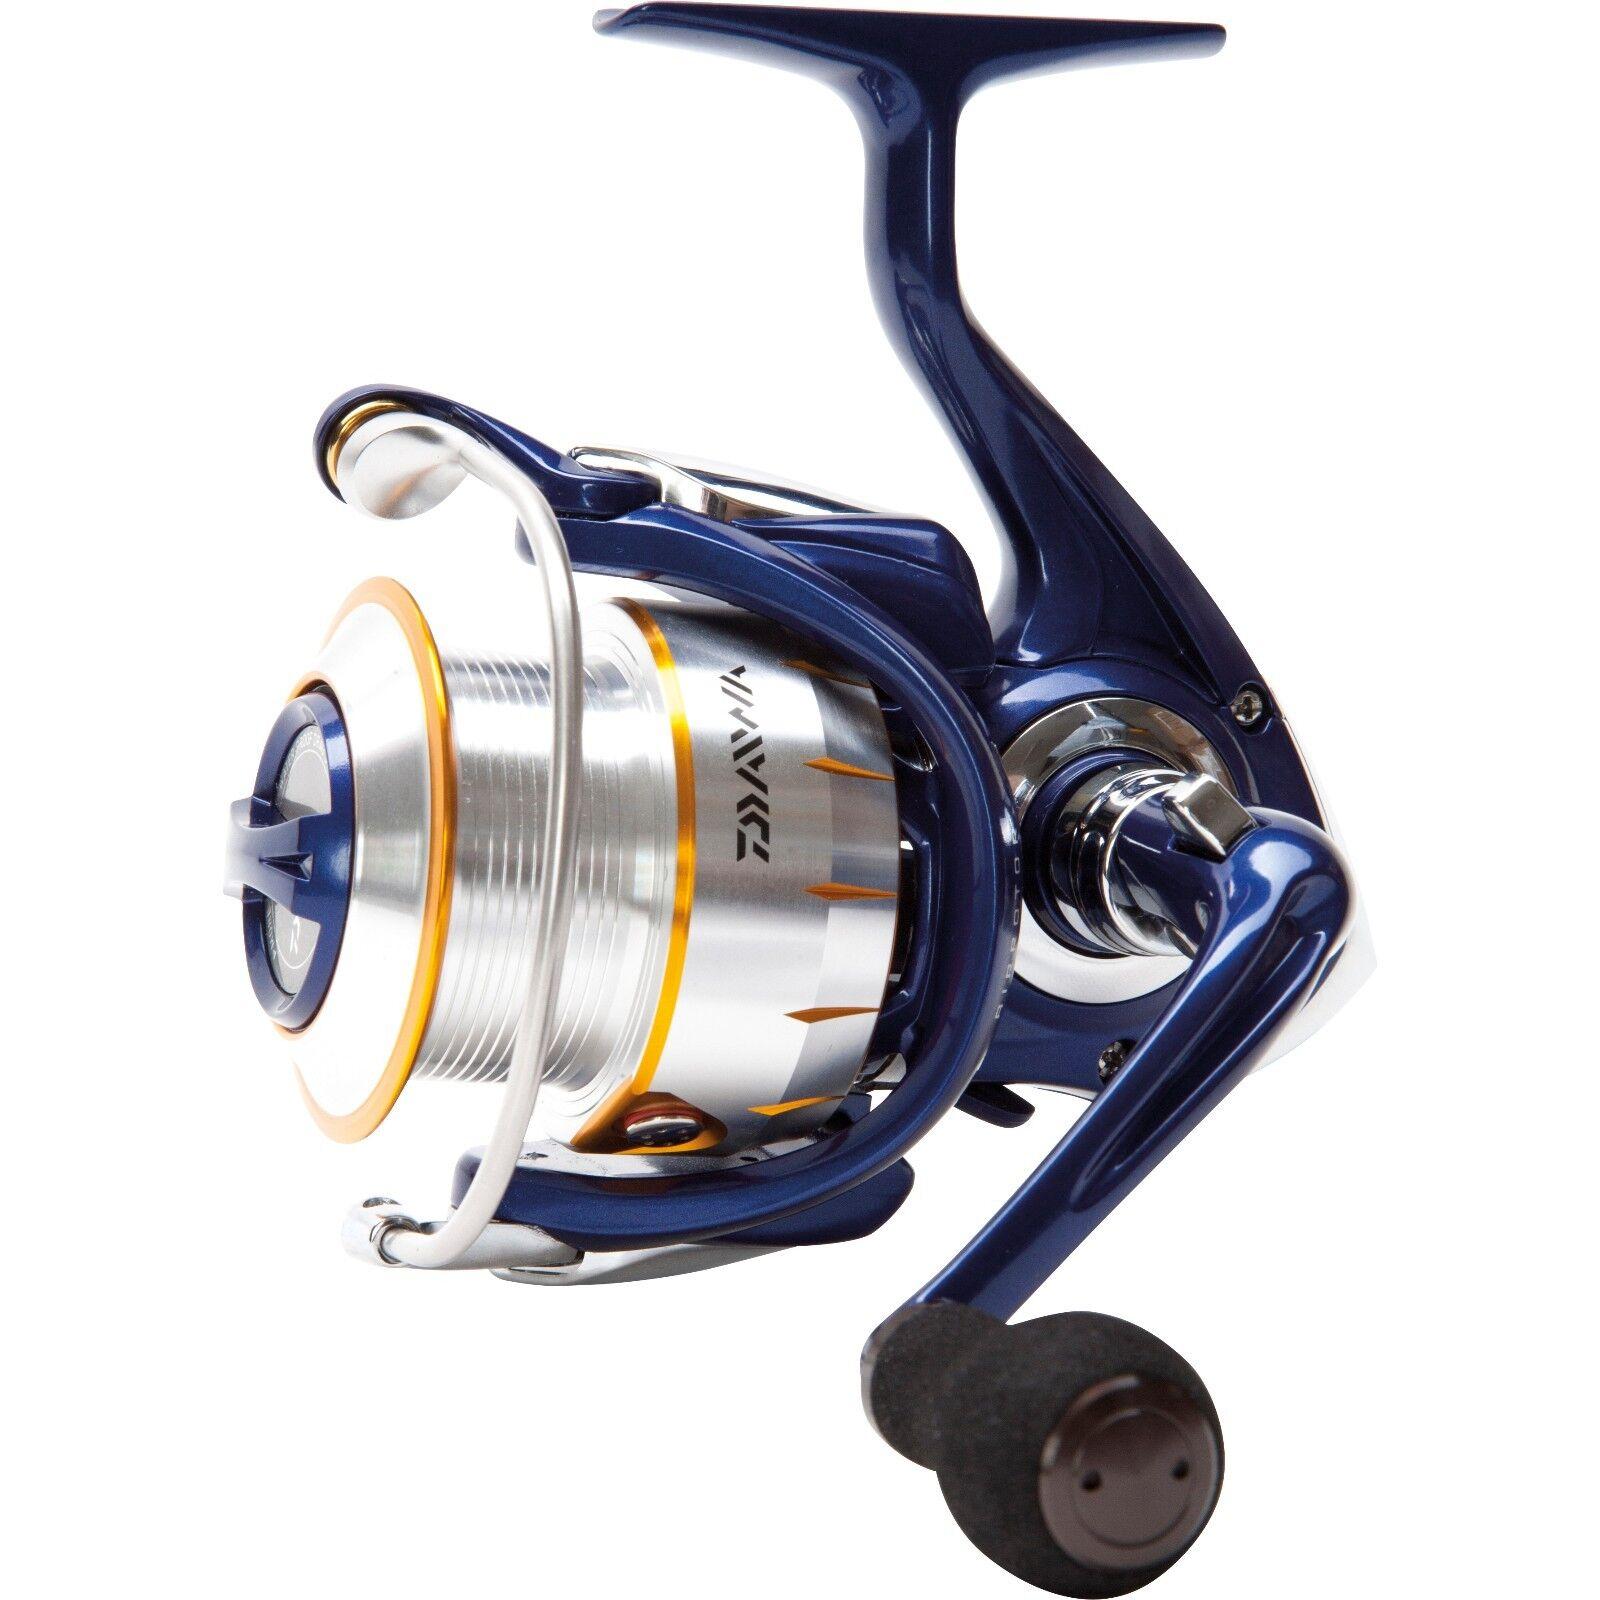 NEW Daiwa TDR Match Coarse  Feeder Fishing Reels - Models 2508, 3012 and 4012  fishional store for sale